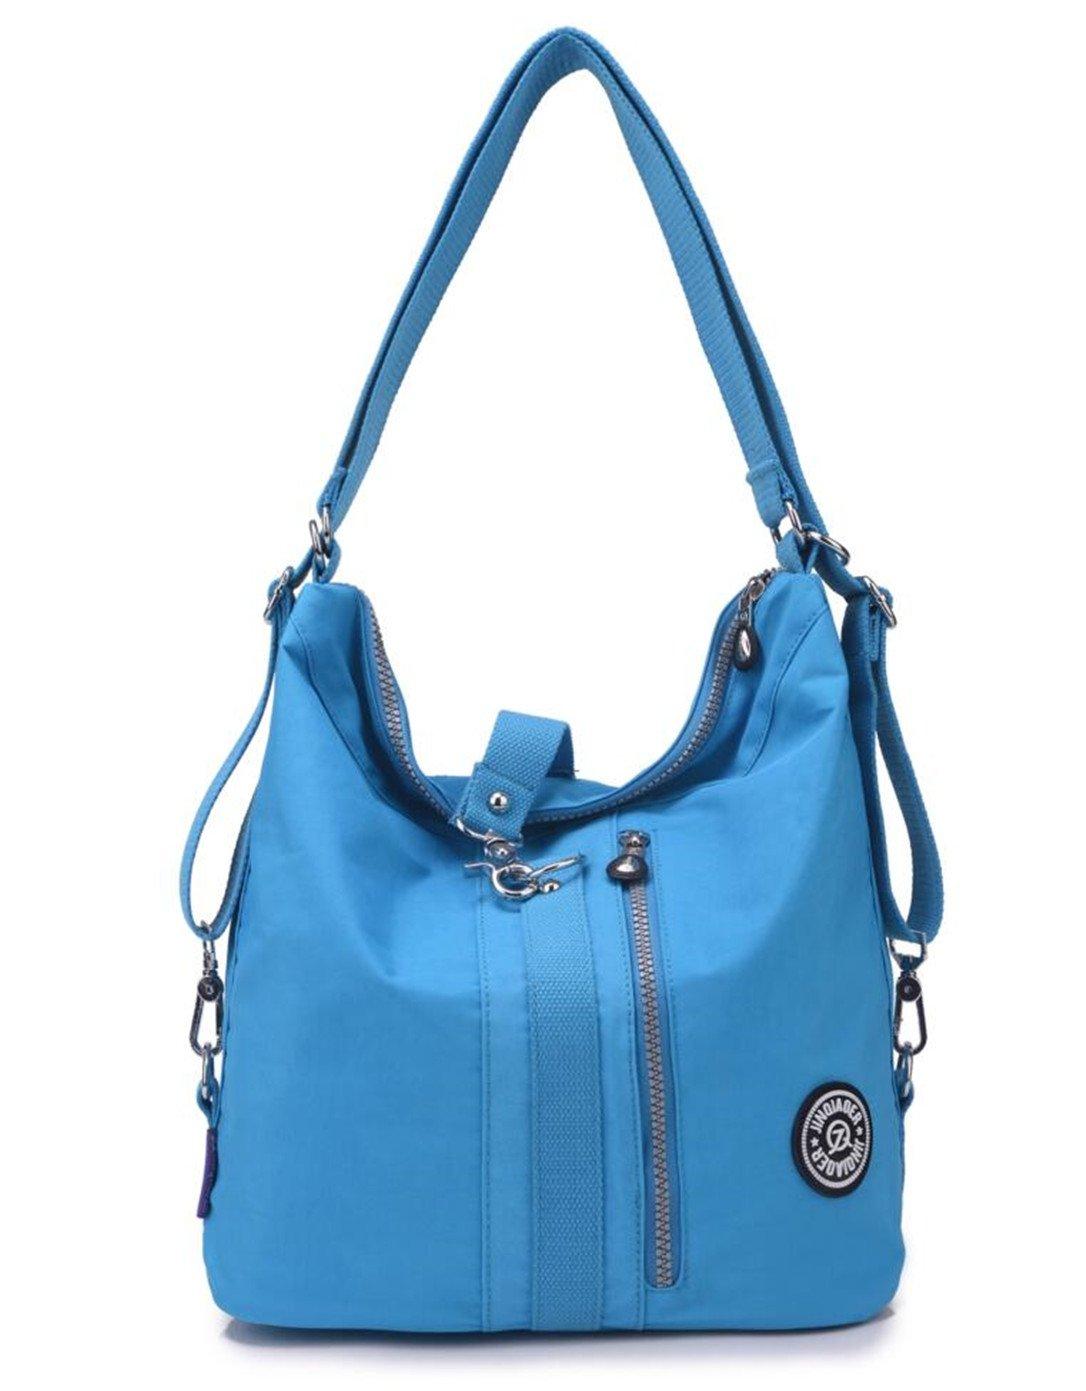 Women's Multipurpose Water-resistant Nylon Shoulder Bag Top Handle Handbag Fashion Travel Backpack Purse for Women (Sky Blue)